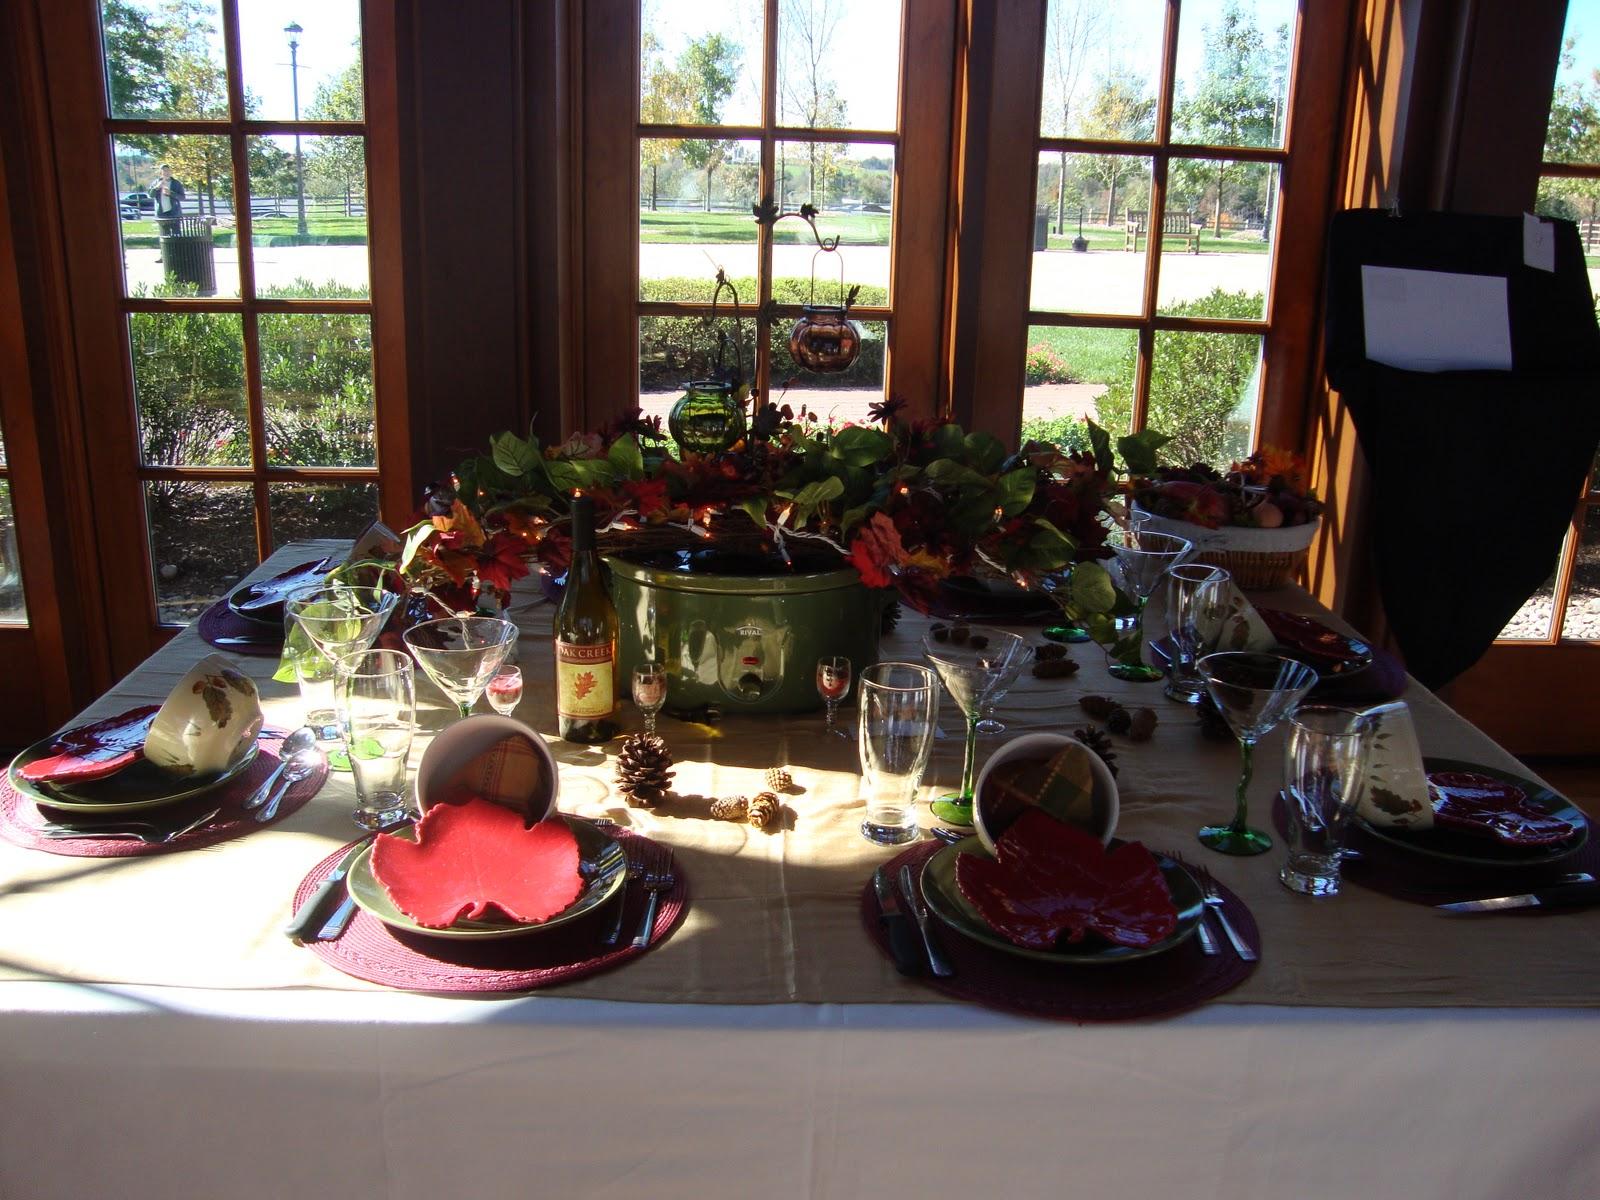 Diamond stone event planning monticello ny wedding planner for Hoya para cocinar